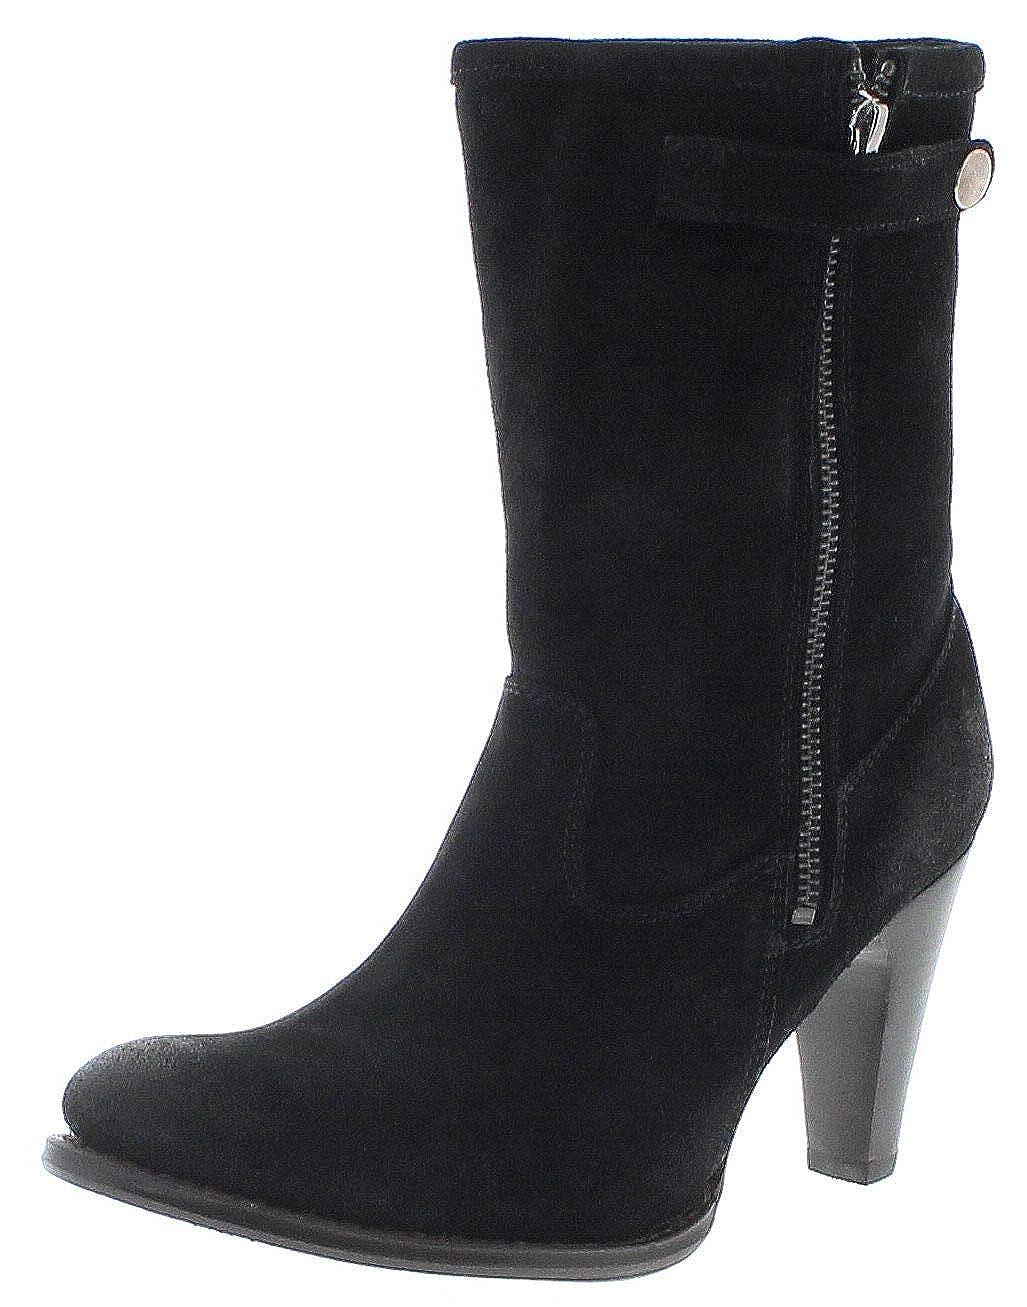 Sendra Stiefel Damen Stiefel 10603 schwarz Lederstiefel mit Lammfell